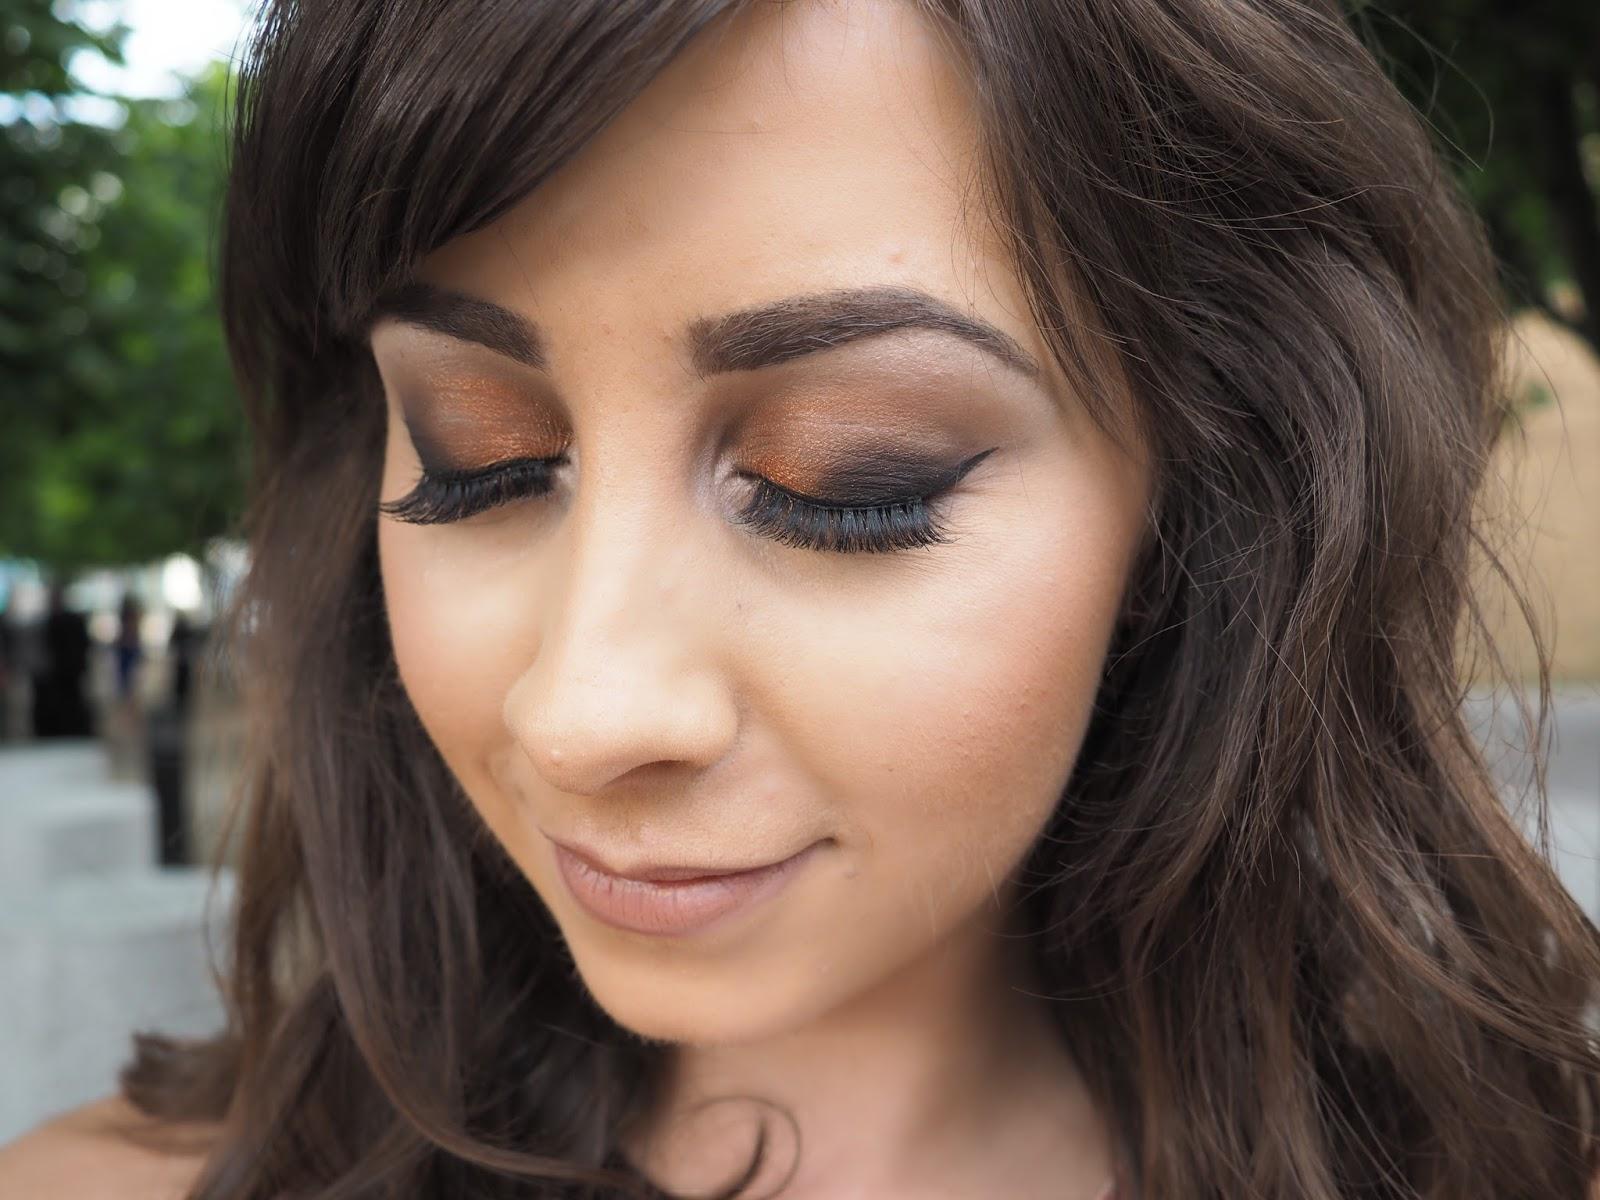 Autumn / Fall Makeup Look | Bronze Smokey Eye